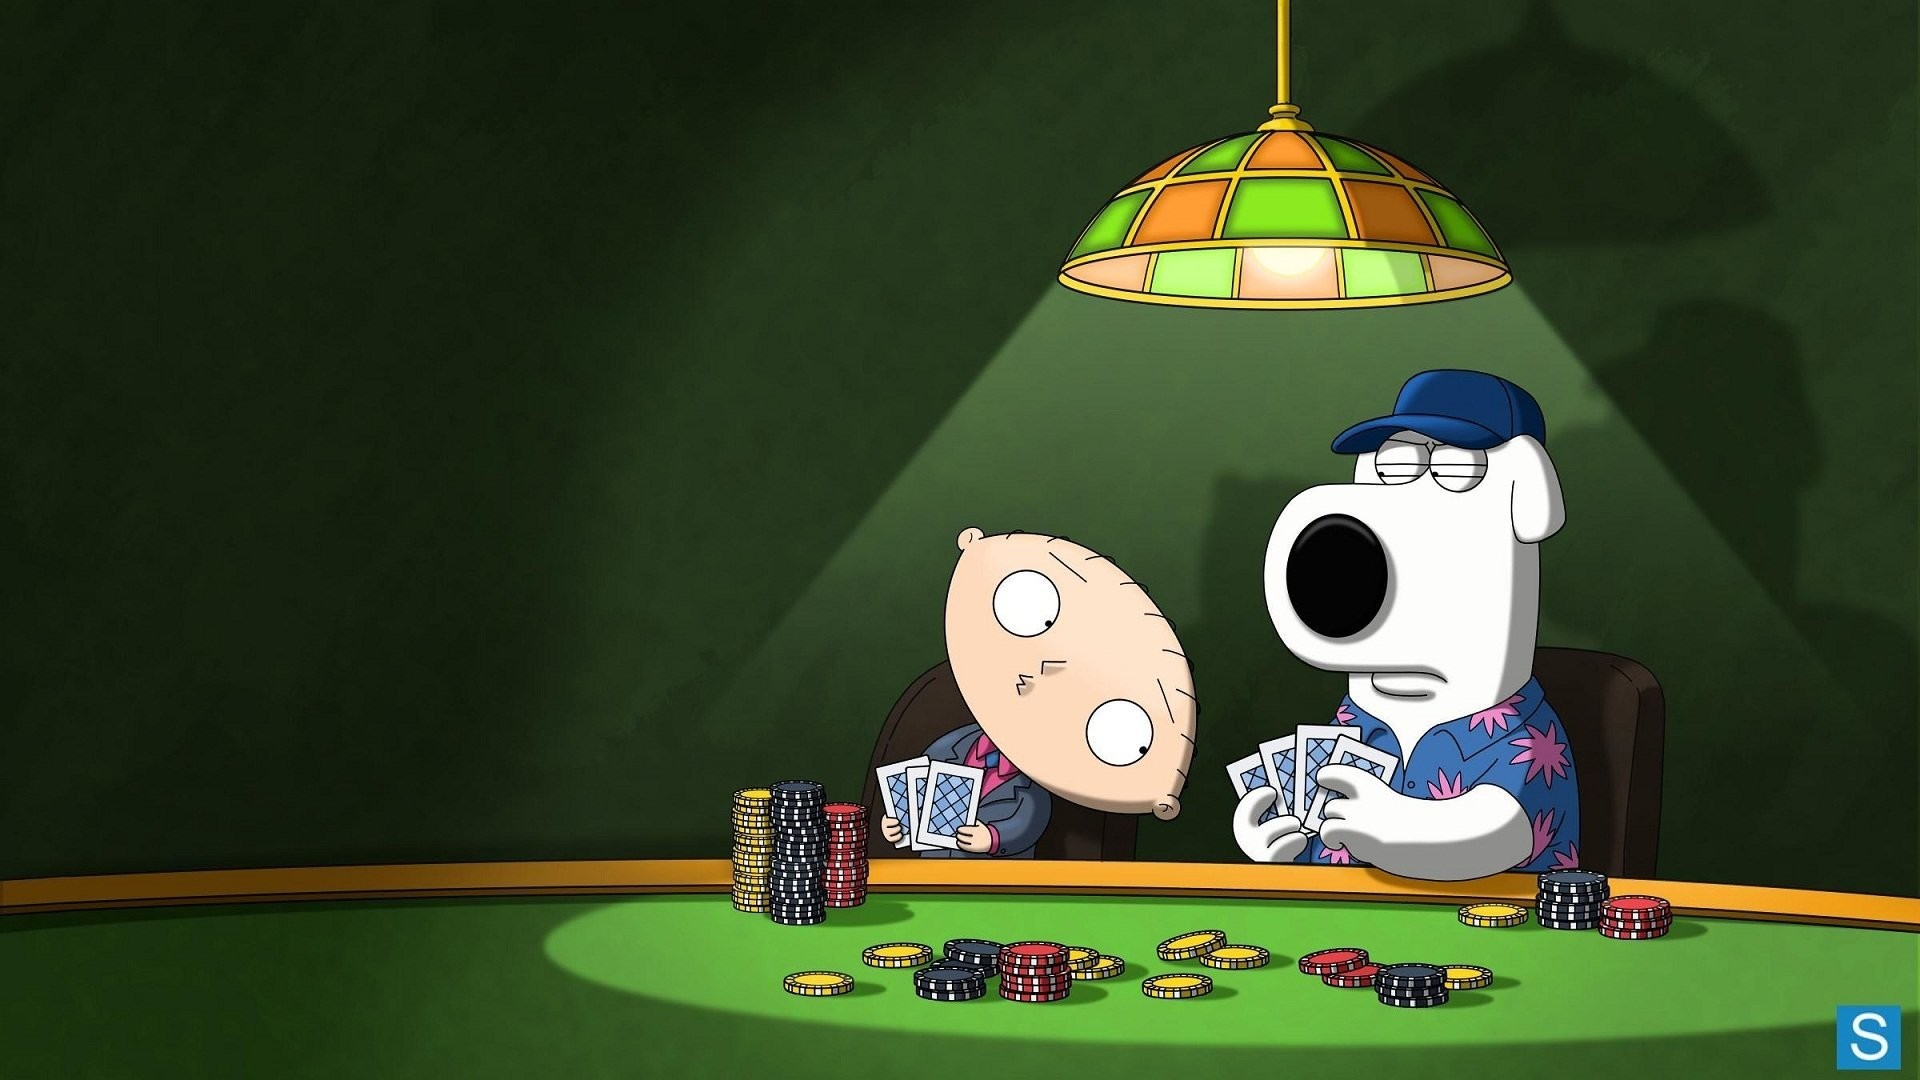 Pokerstars legal states